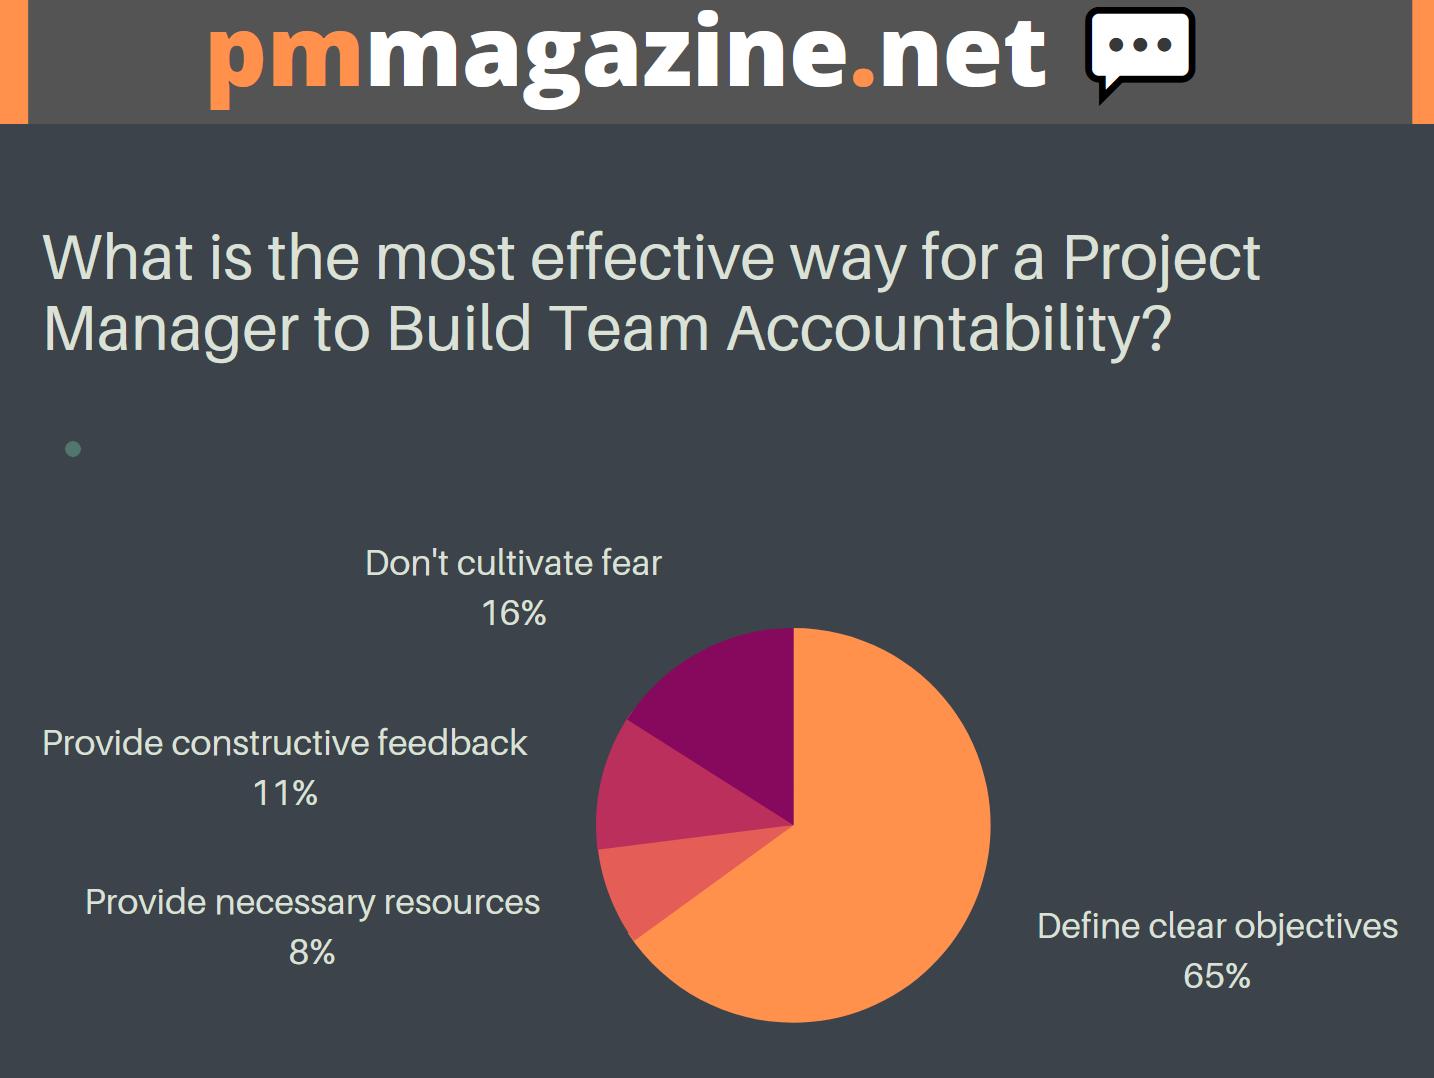 pmmagazine.net - Team Accountability - Poll